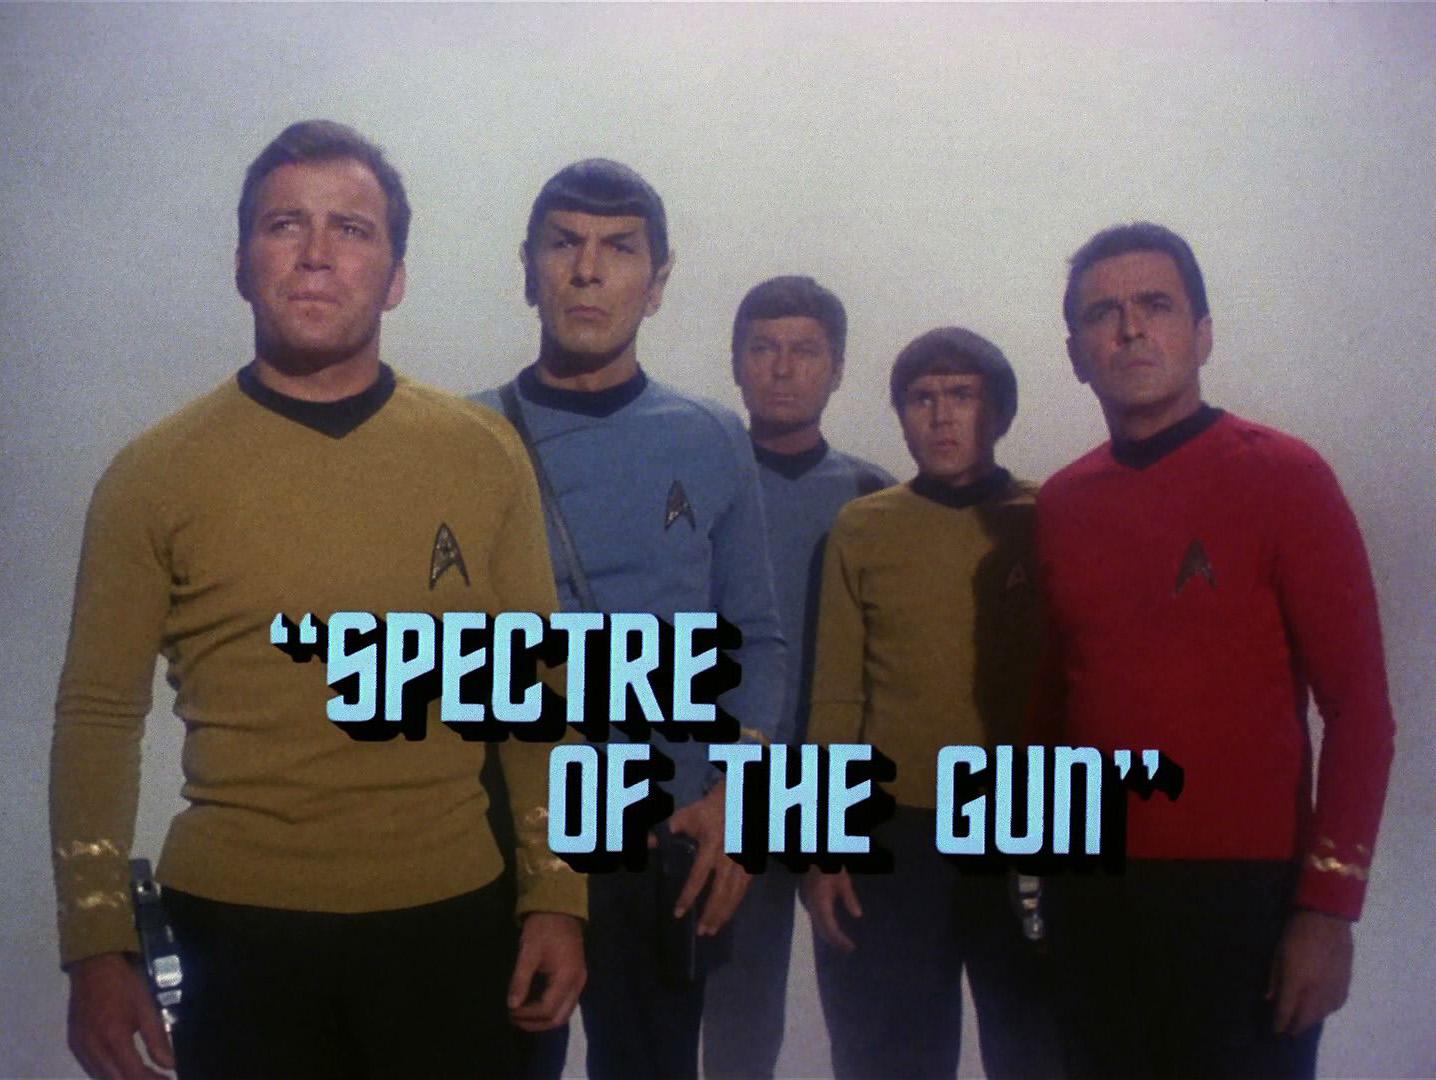 Spectre Of The Gun Episode Memory Alpha Fandom Powered By Wikia Red Alert Star Trek Alarm Siren 1 43853 2268 Title Card